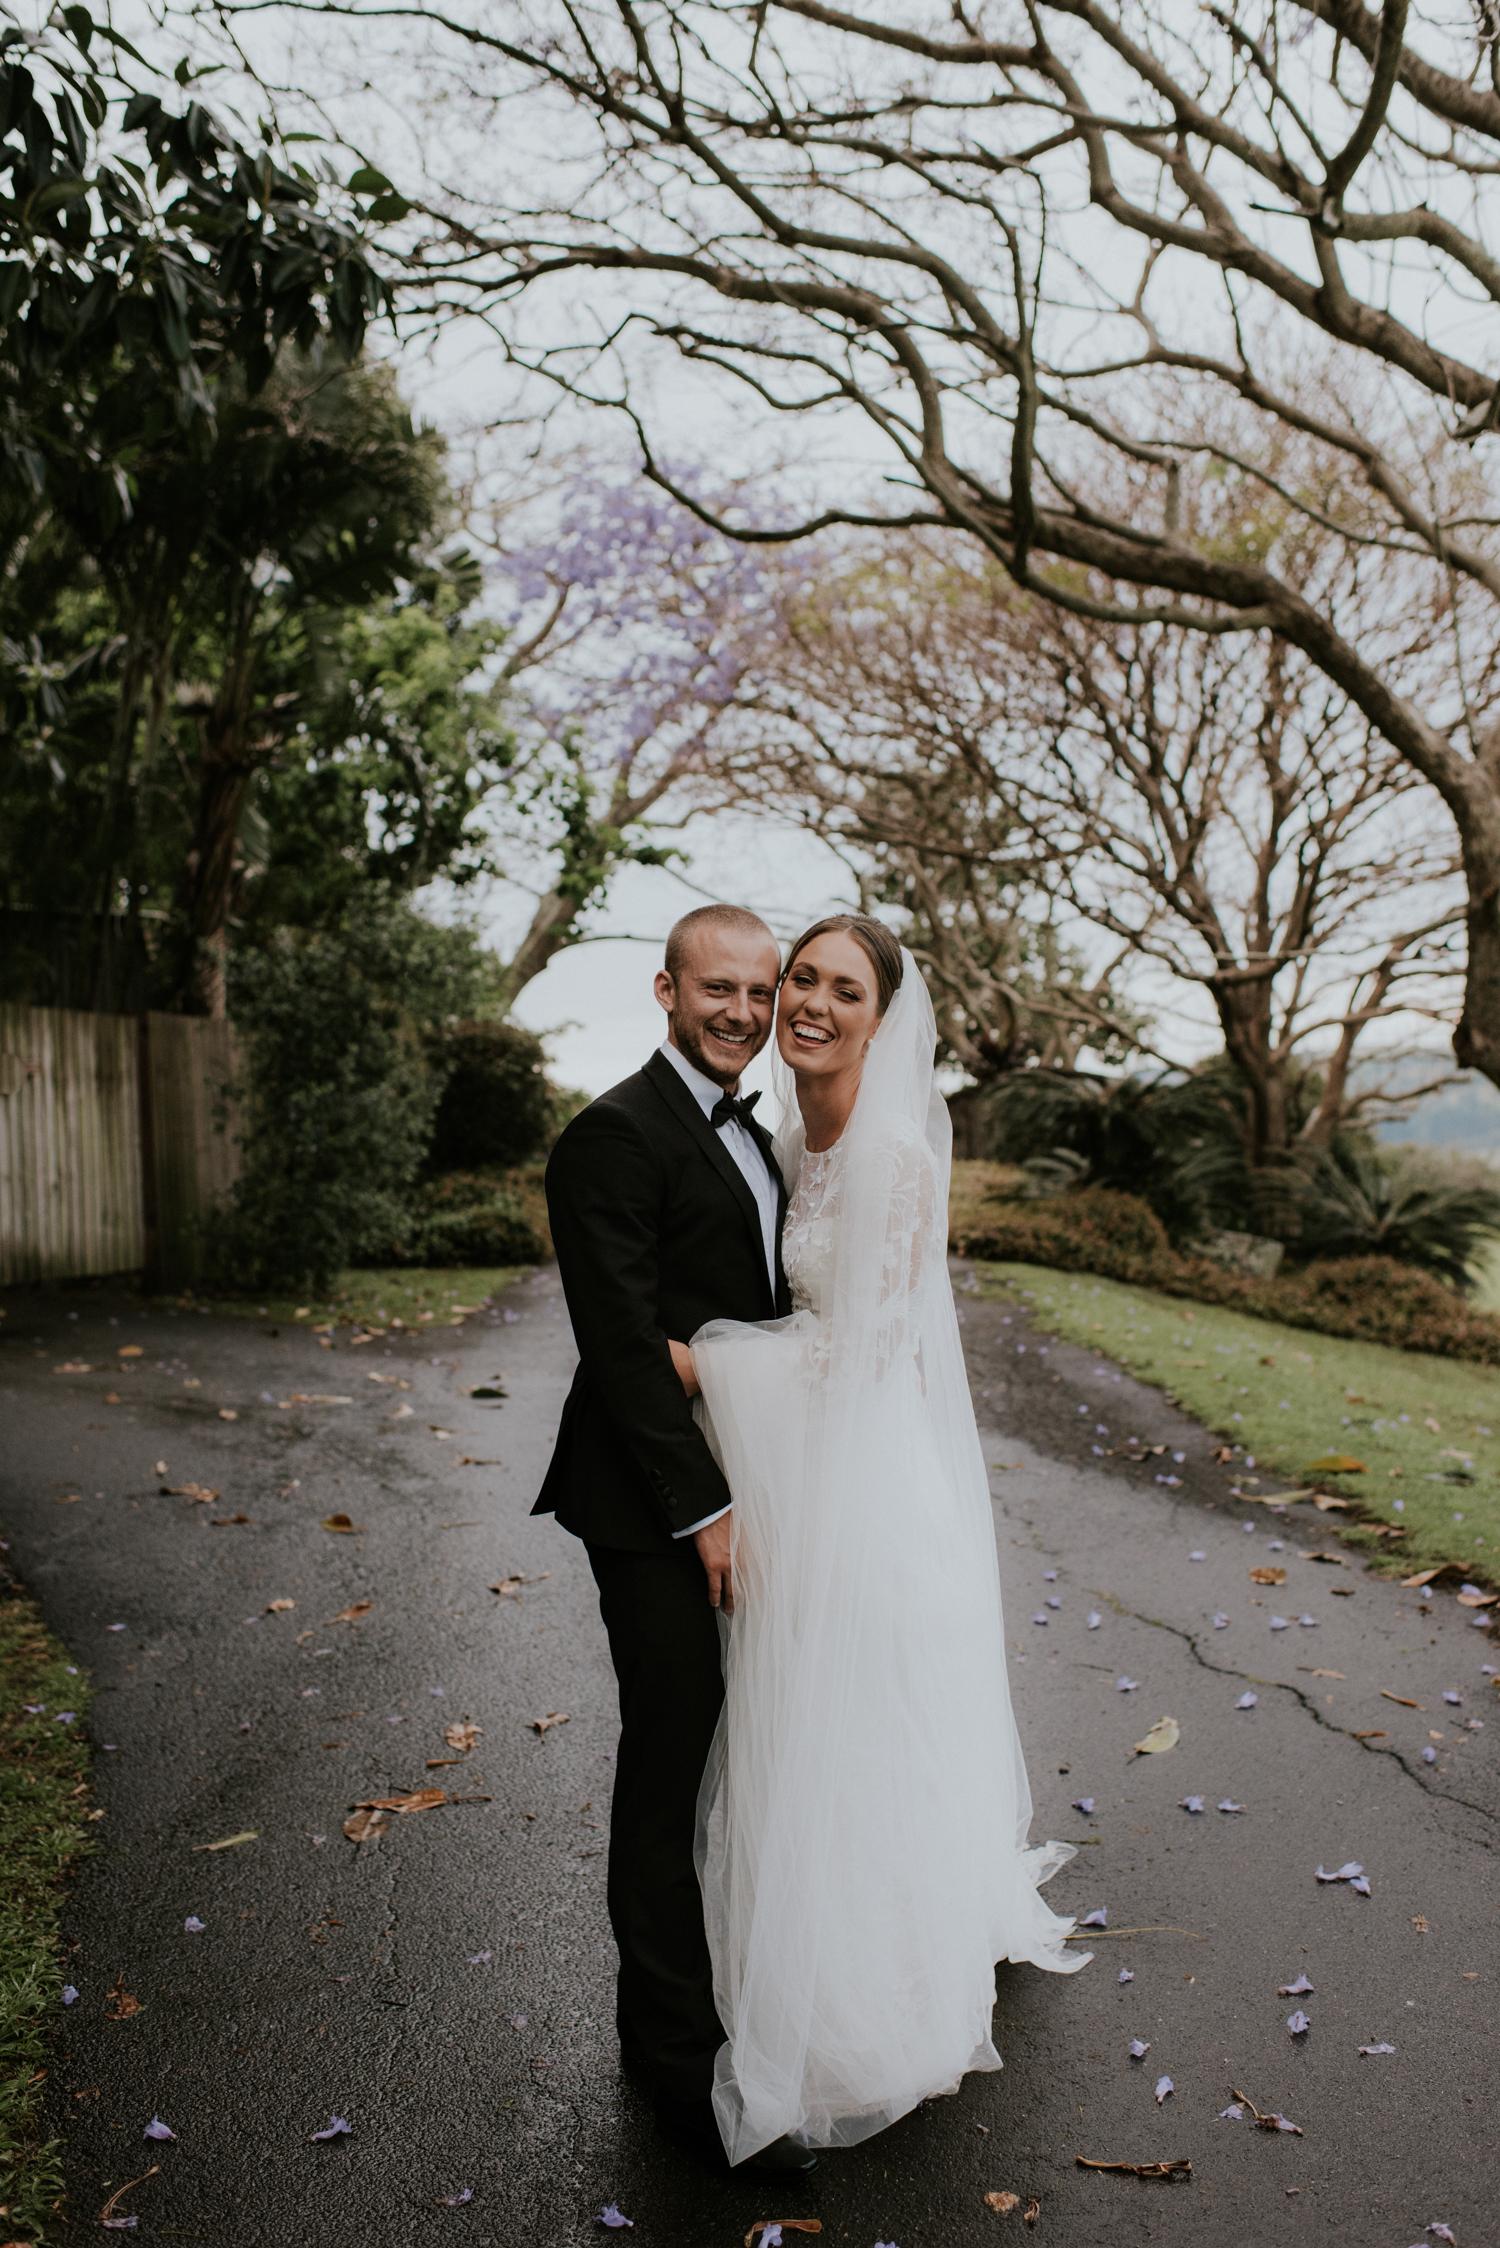 Brisbane Wedding Photographer   Engagement-Elopement Photography-87.jpg